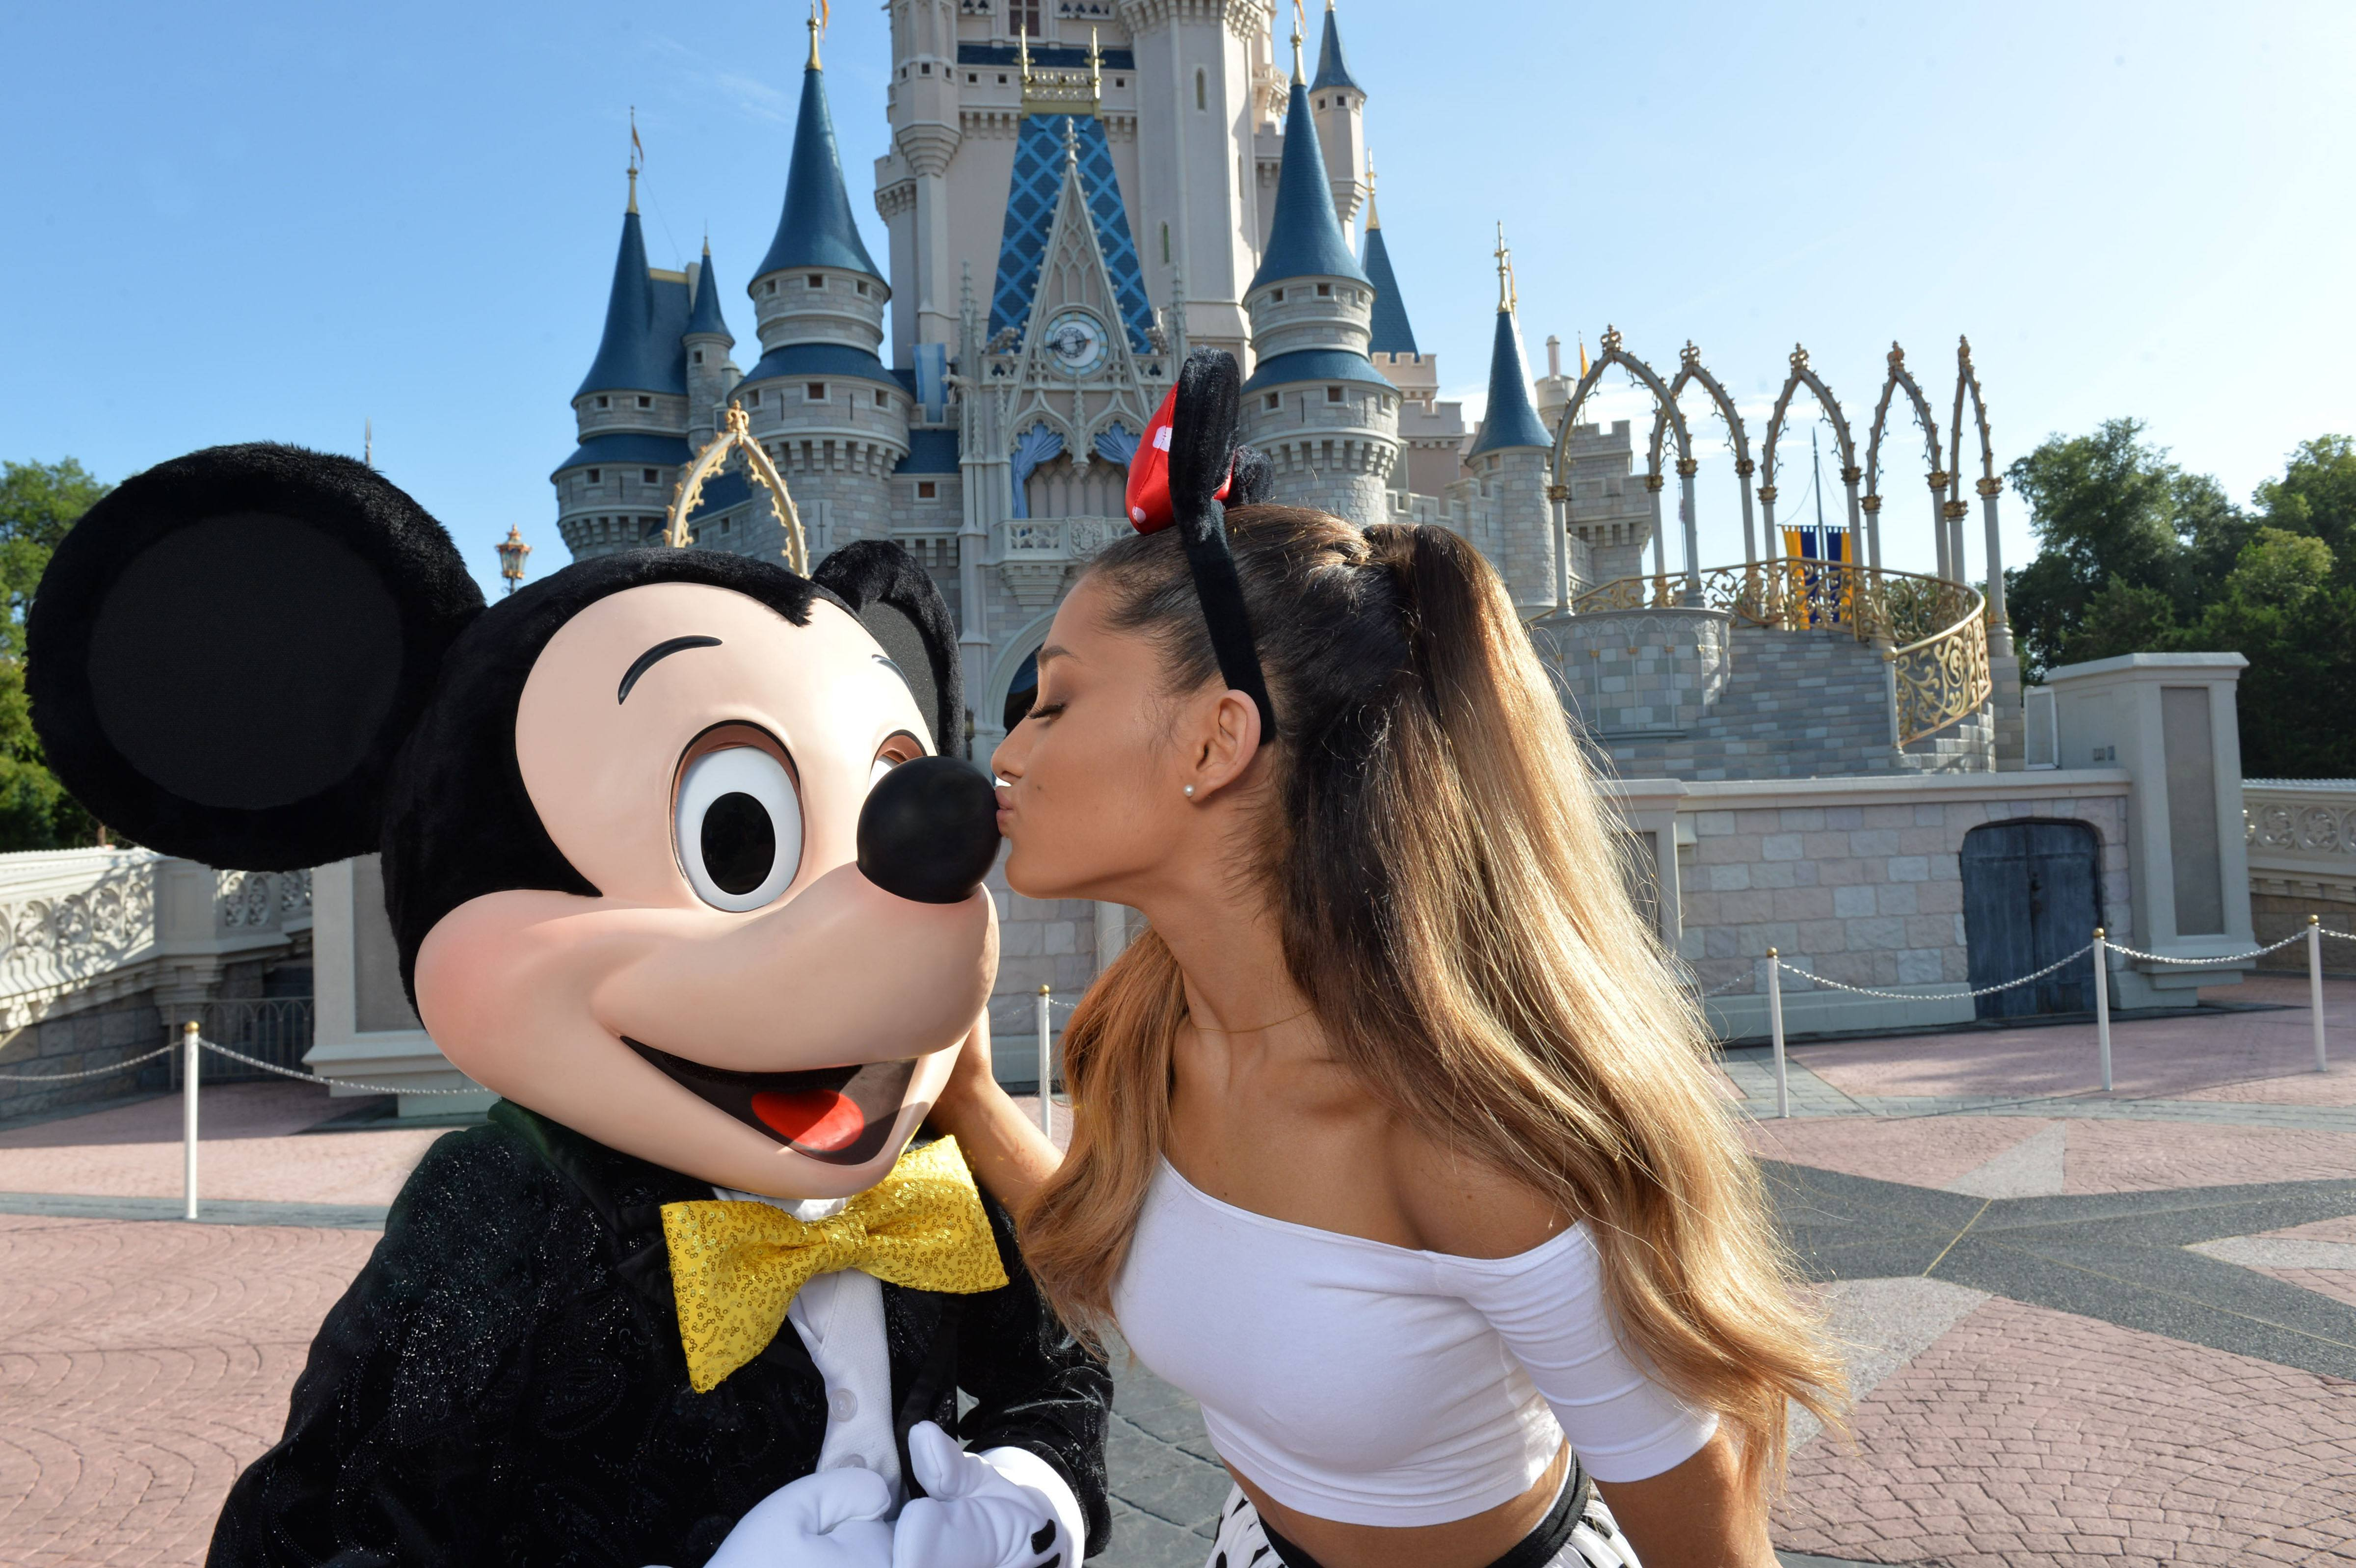 Ariana Grande at Disney